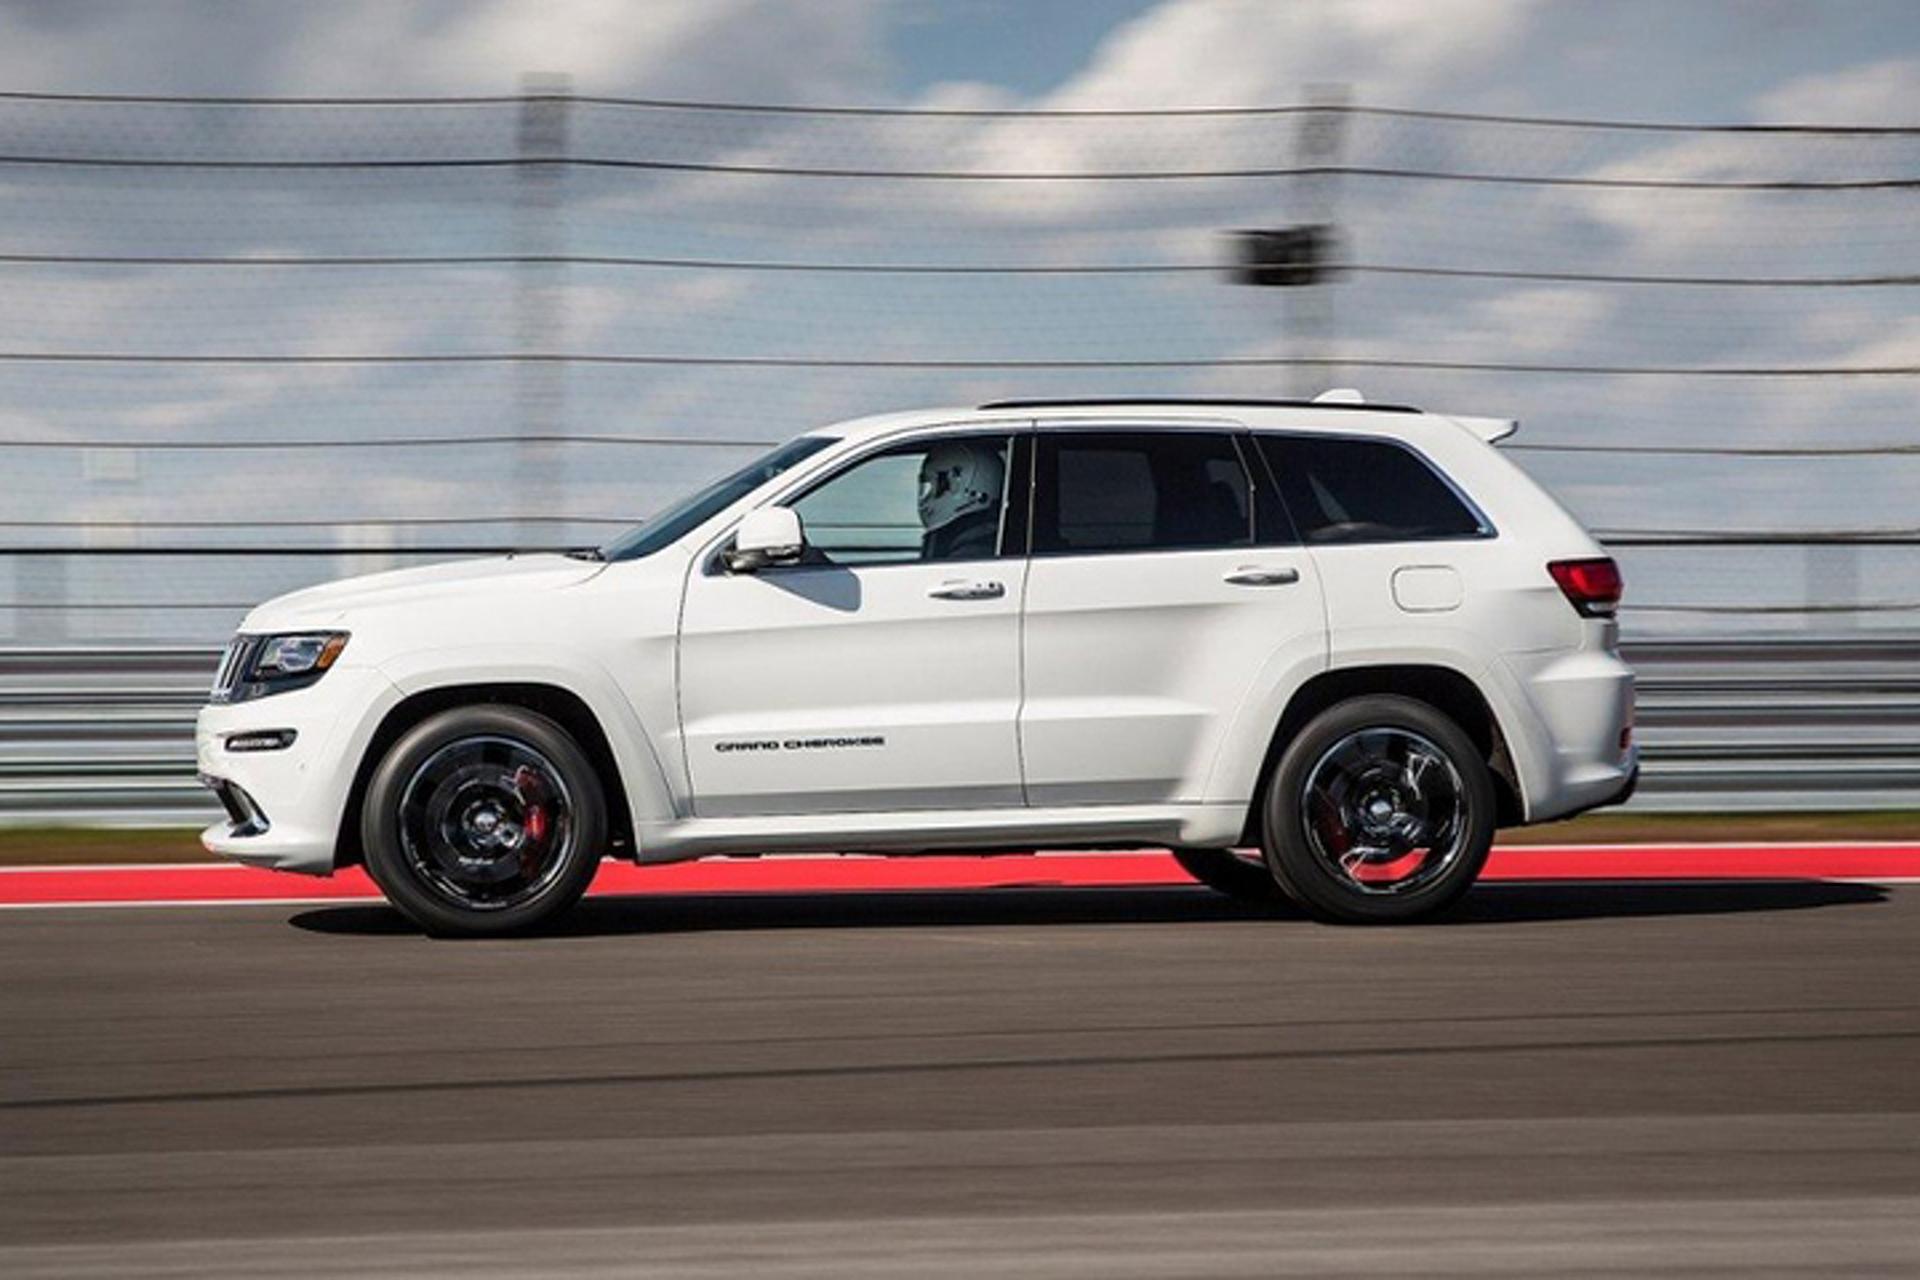 Hot-Rod SUV: Jeep Will Produce the Grand Cherokee SRT Trackhawk